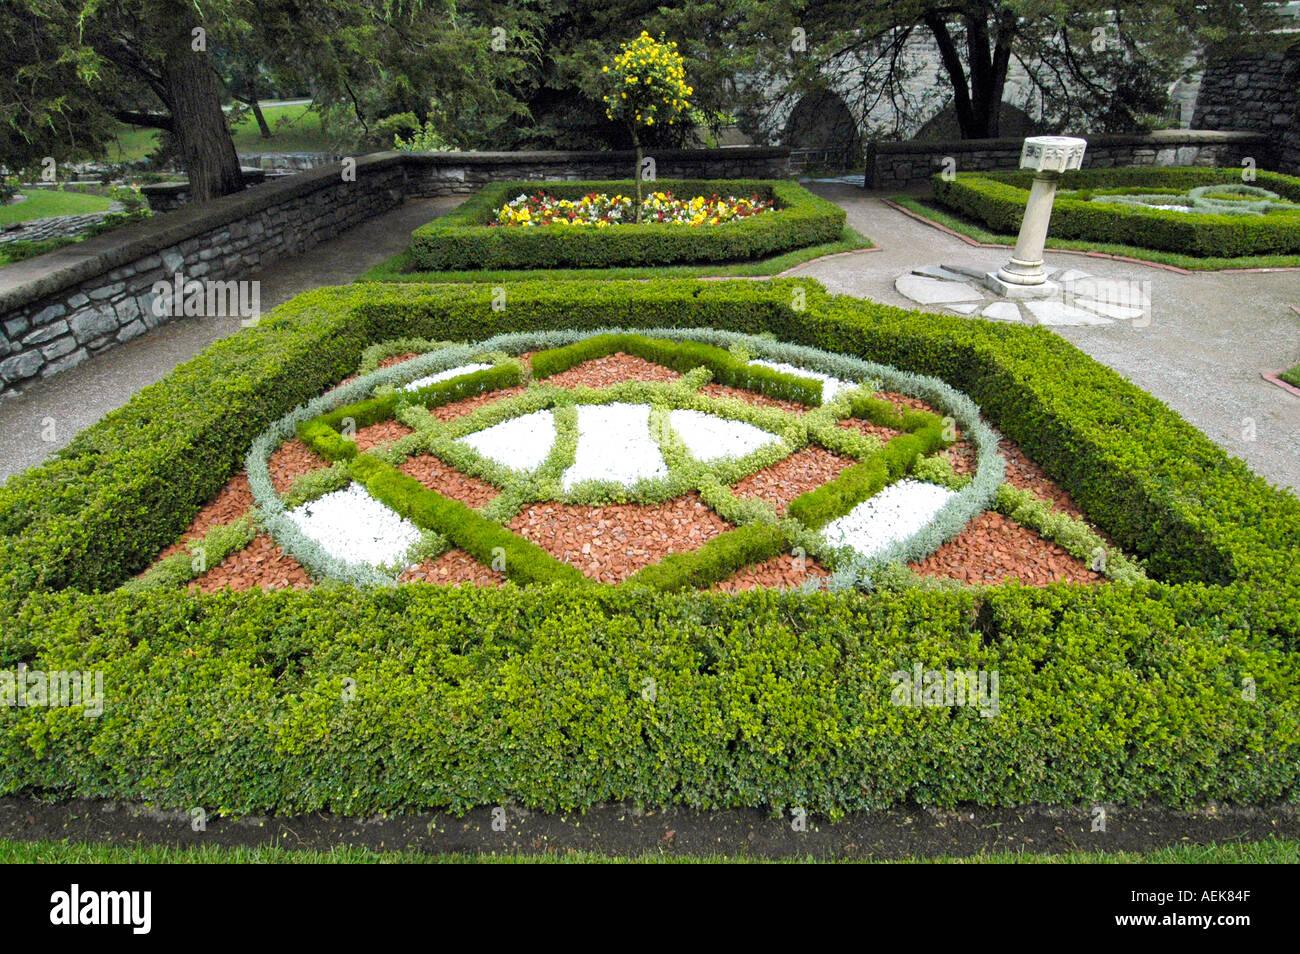 Shakespearean Gardens Stratford Ontario Canada - Stock Image